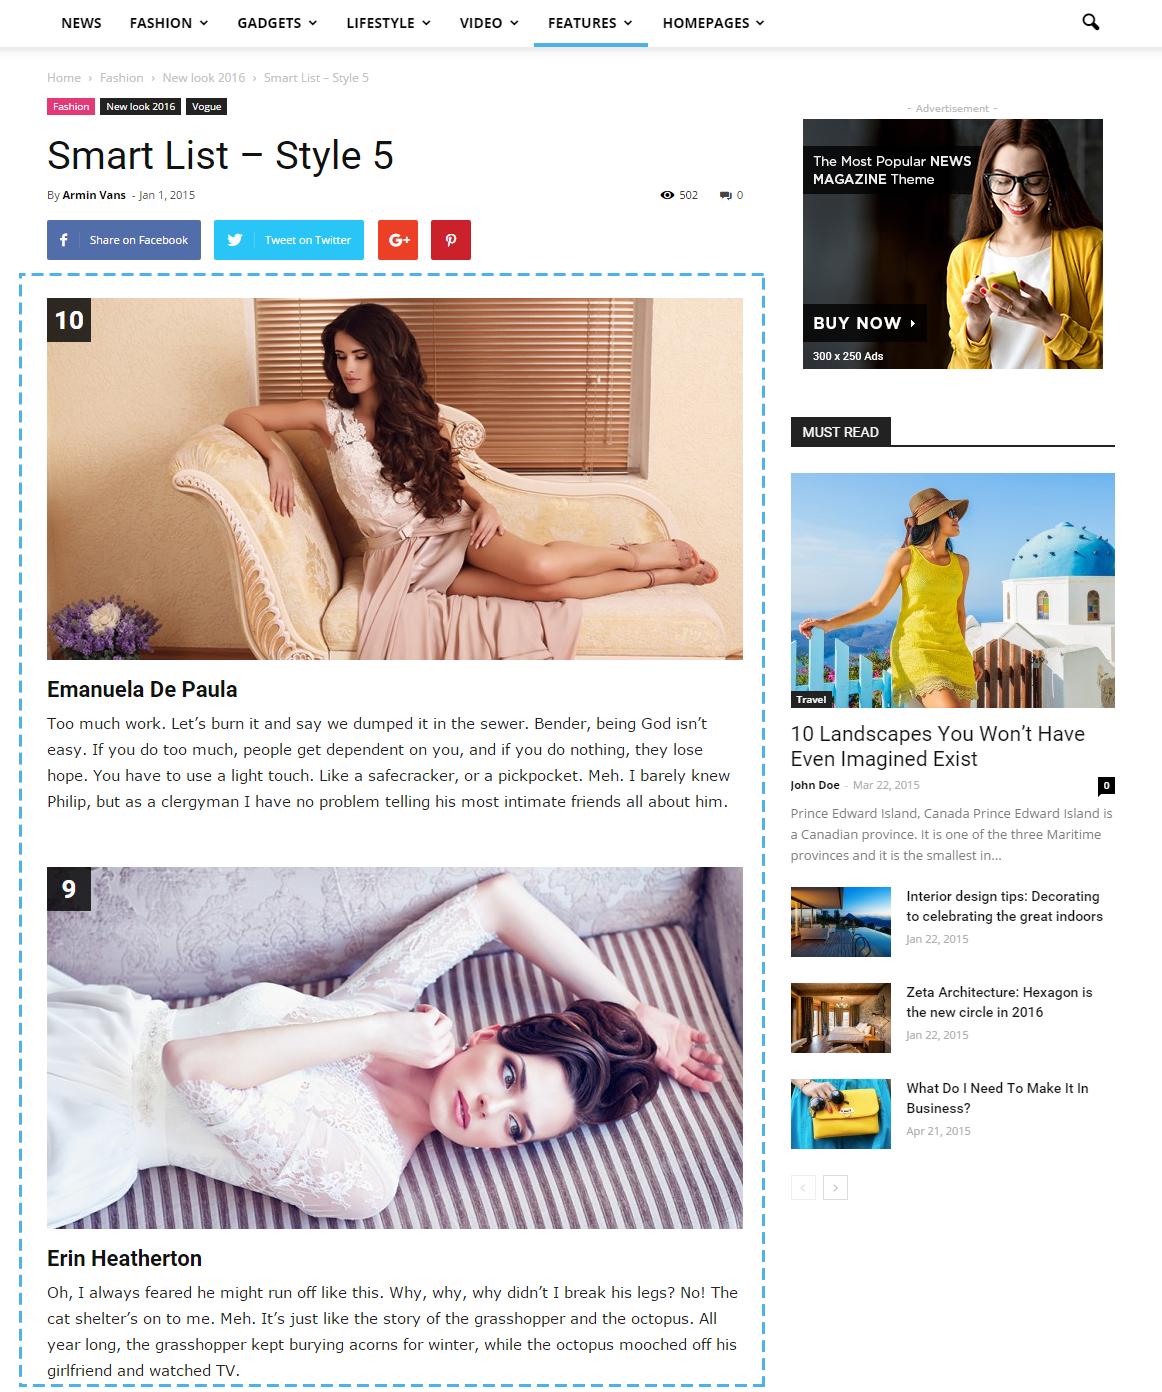 newspaper-smart-list-5